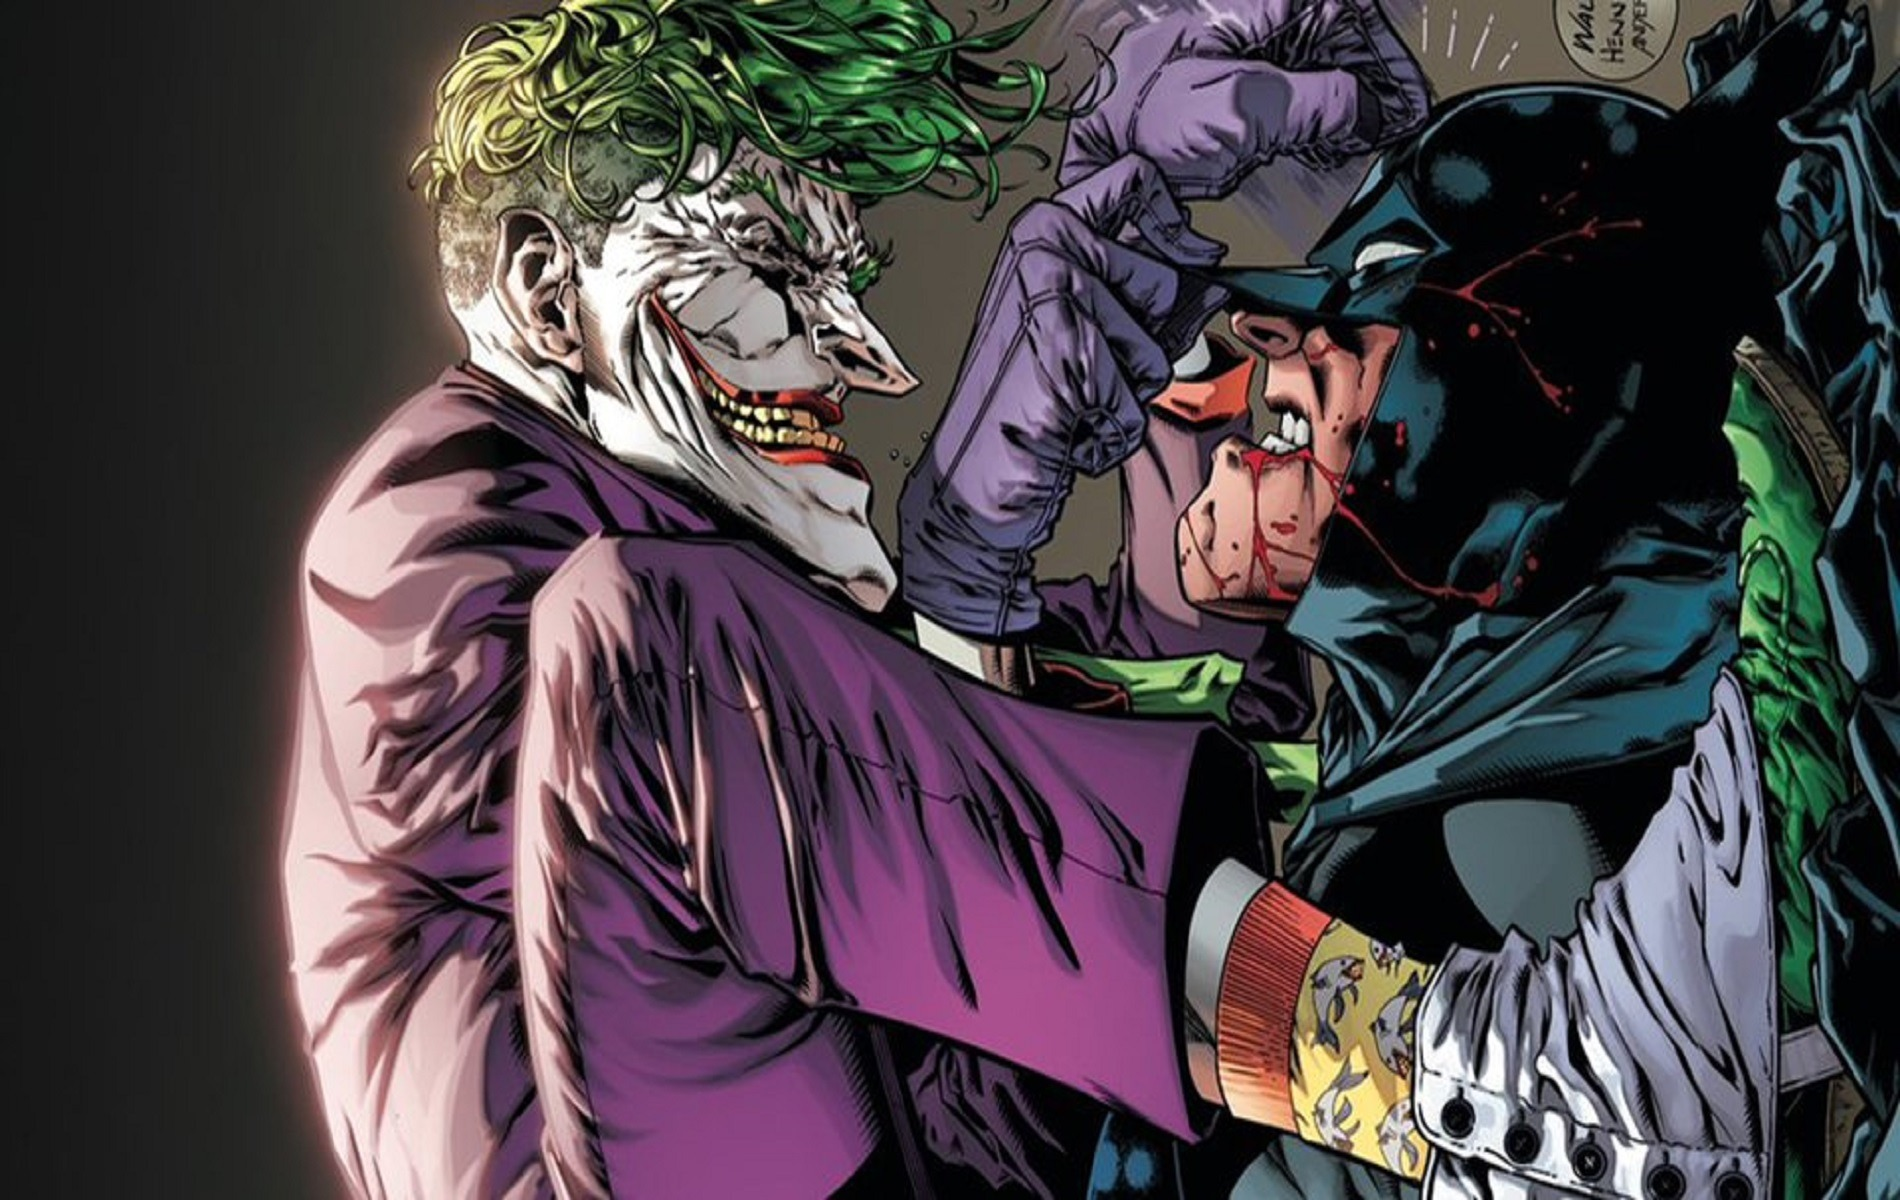 джокер знает кто такой бэтмен